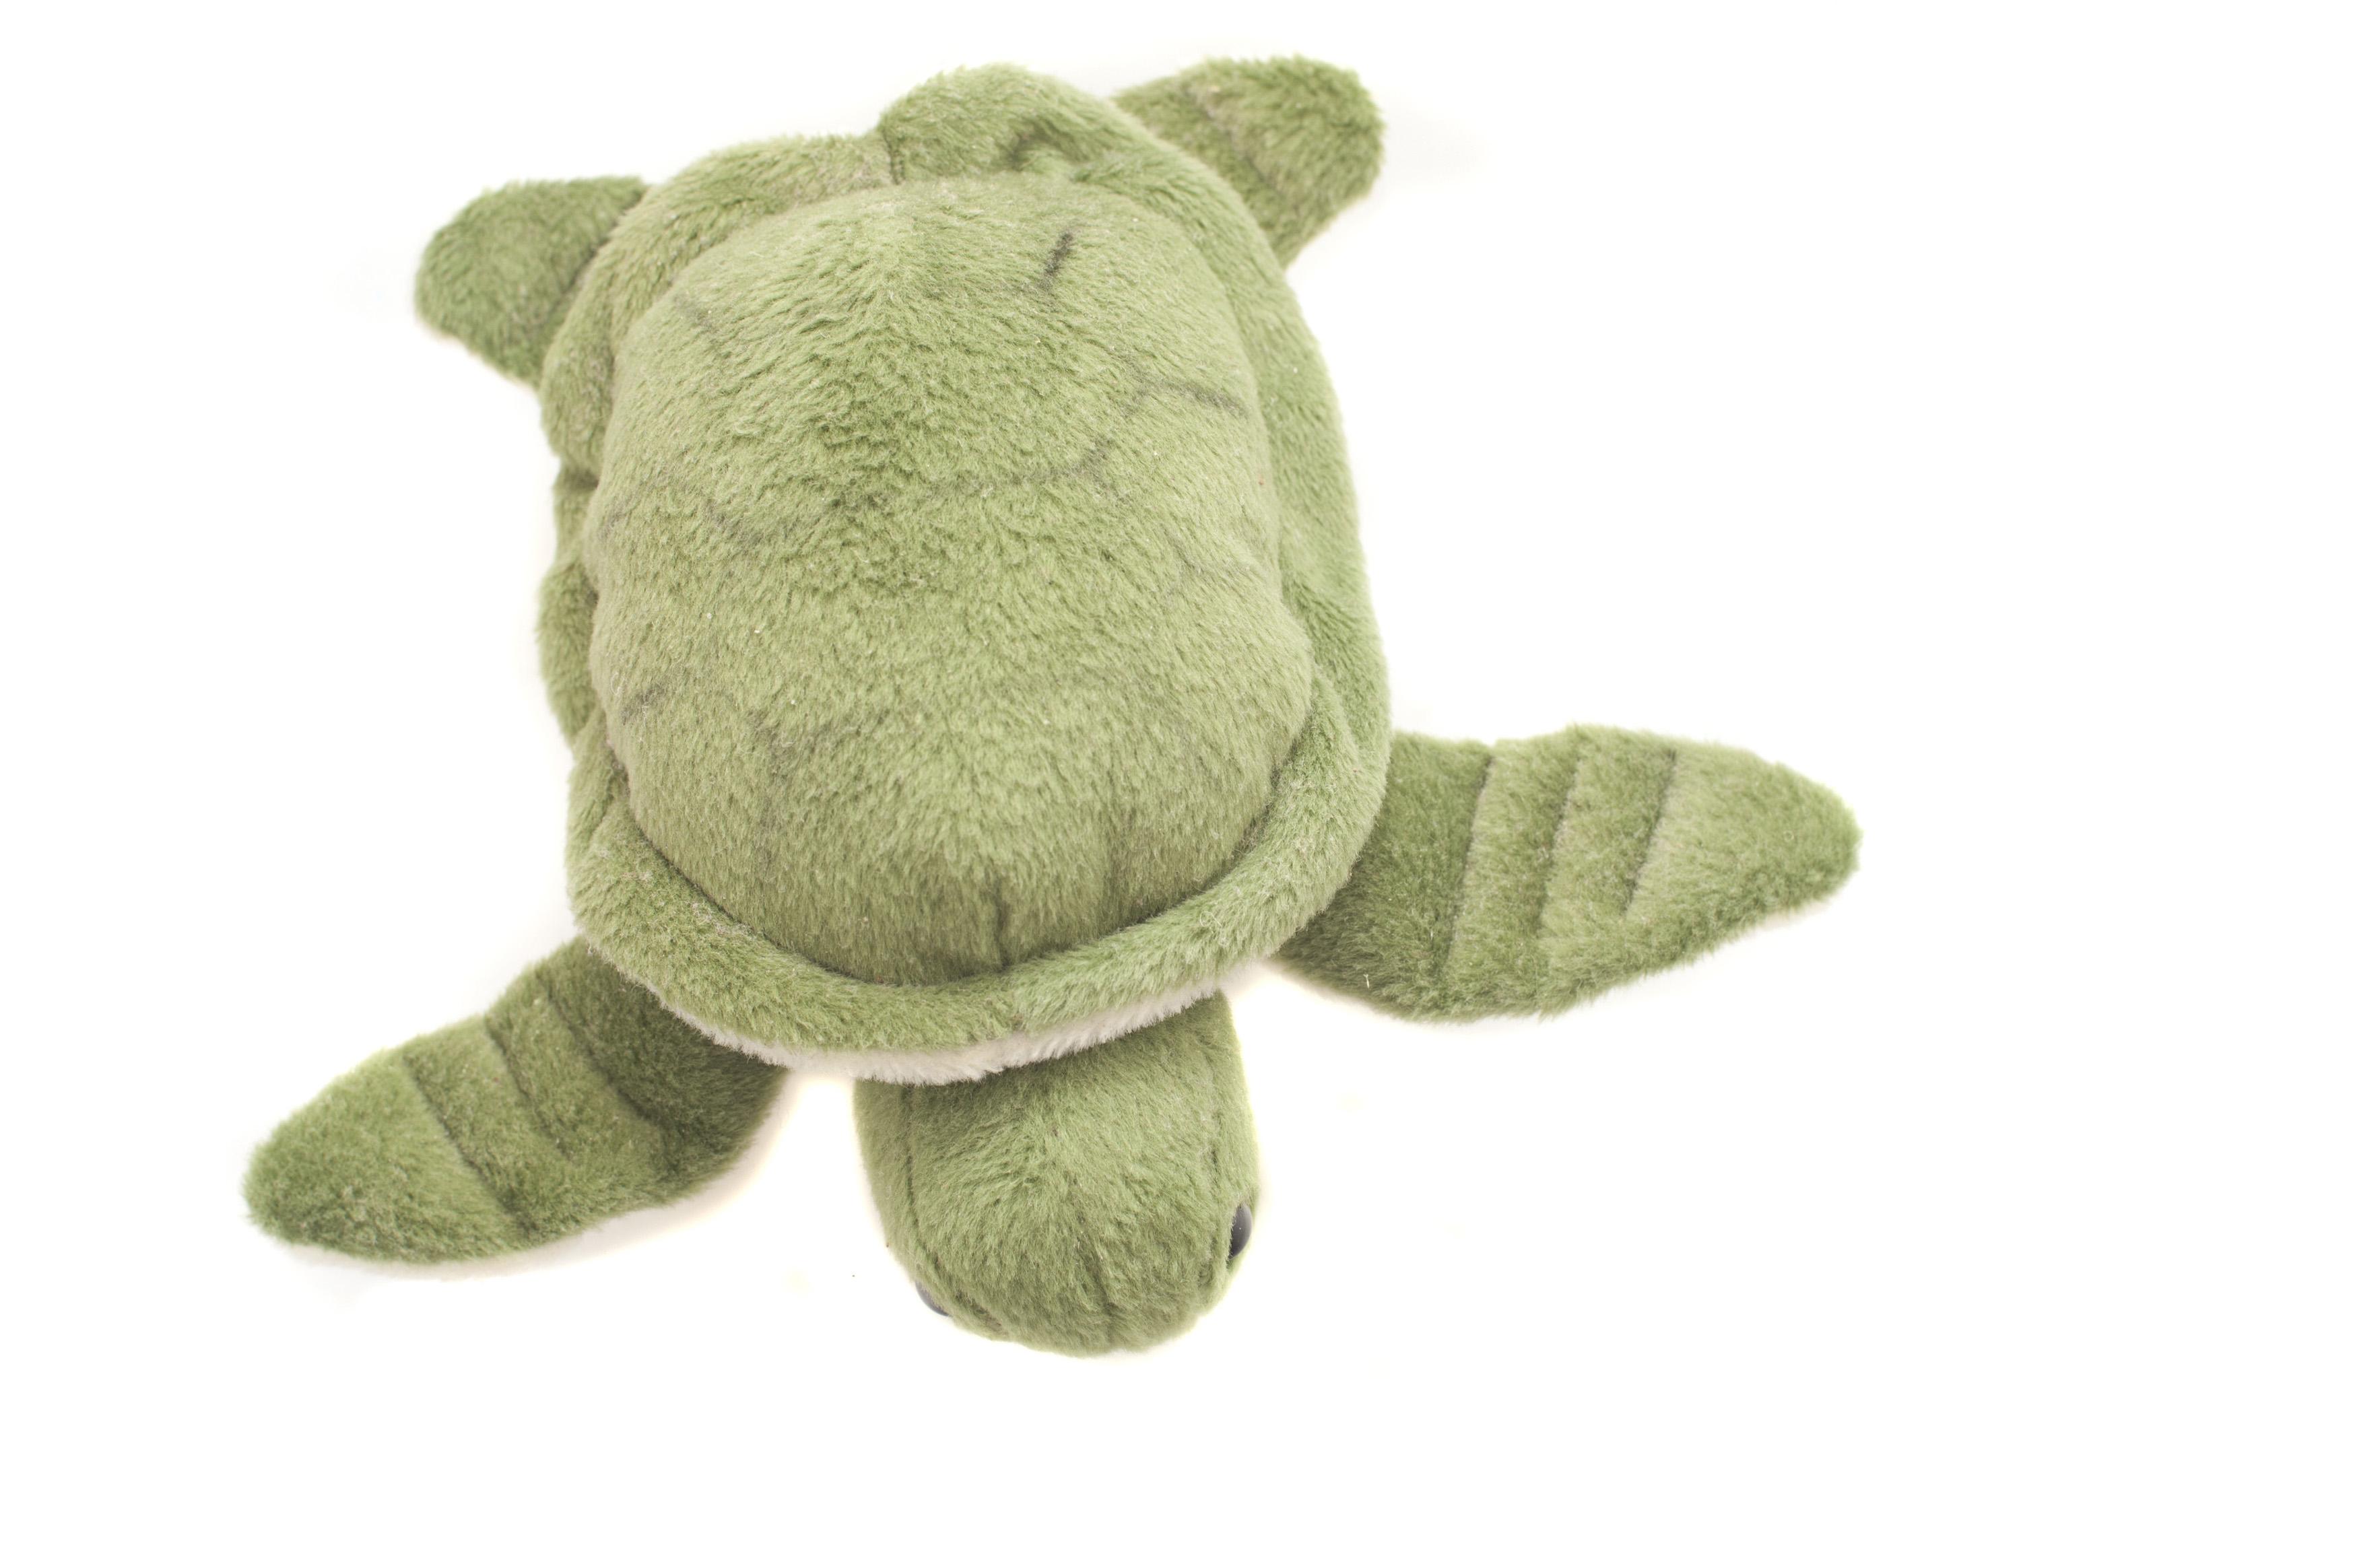 Teddy bear information and fun, teddy bears and